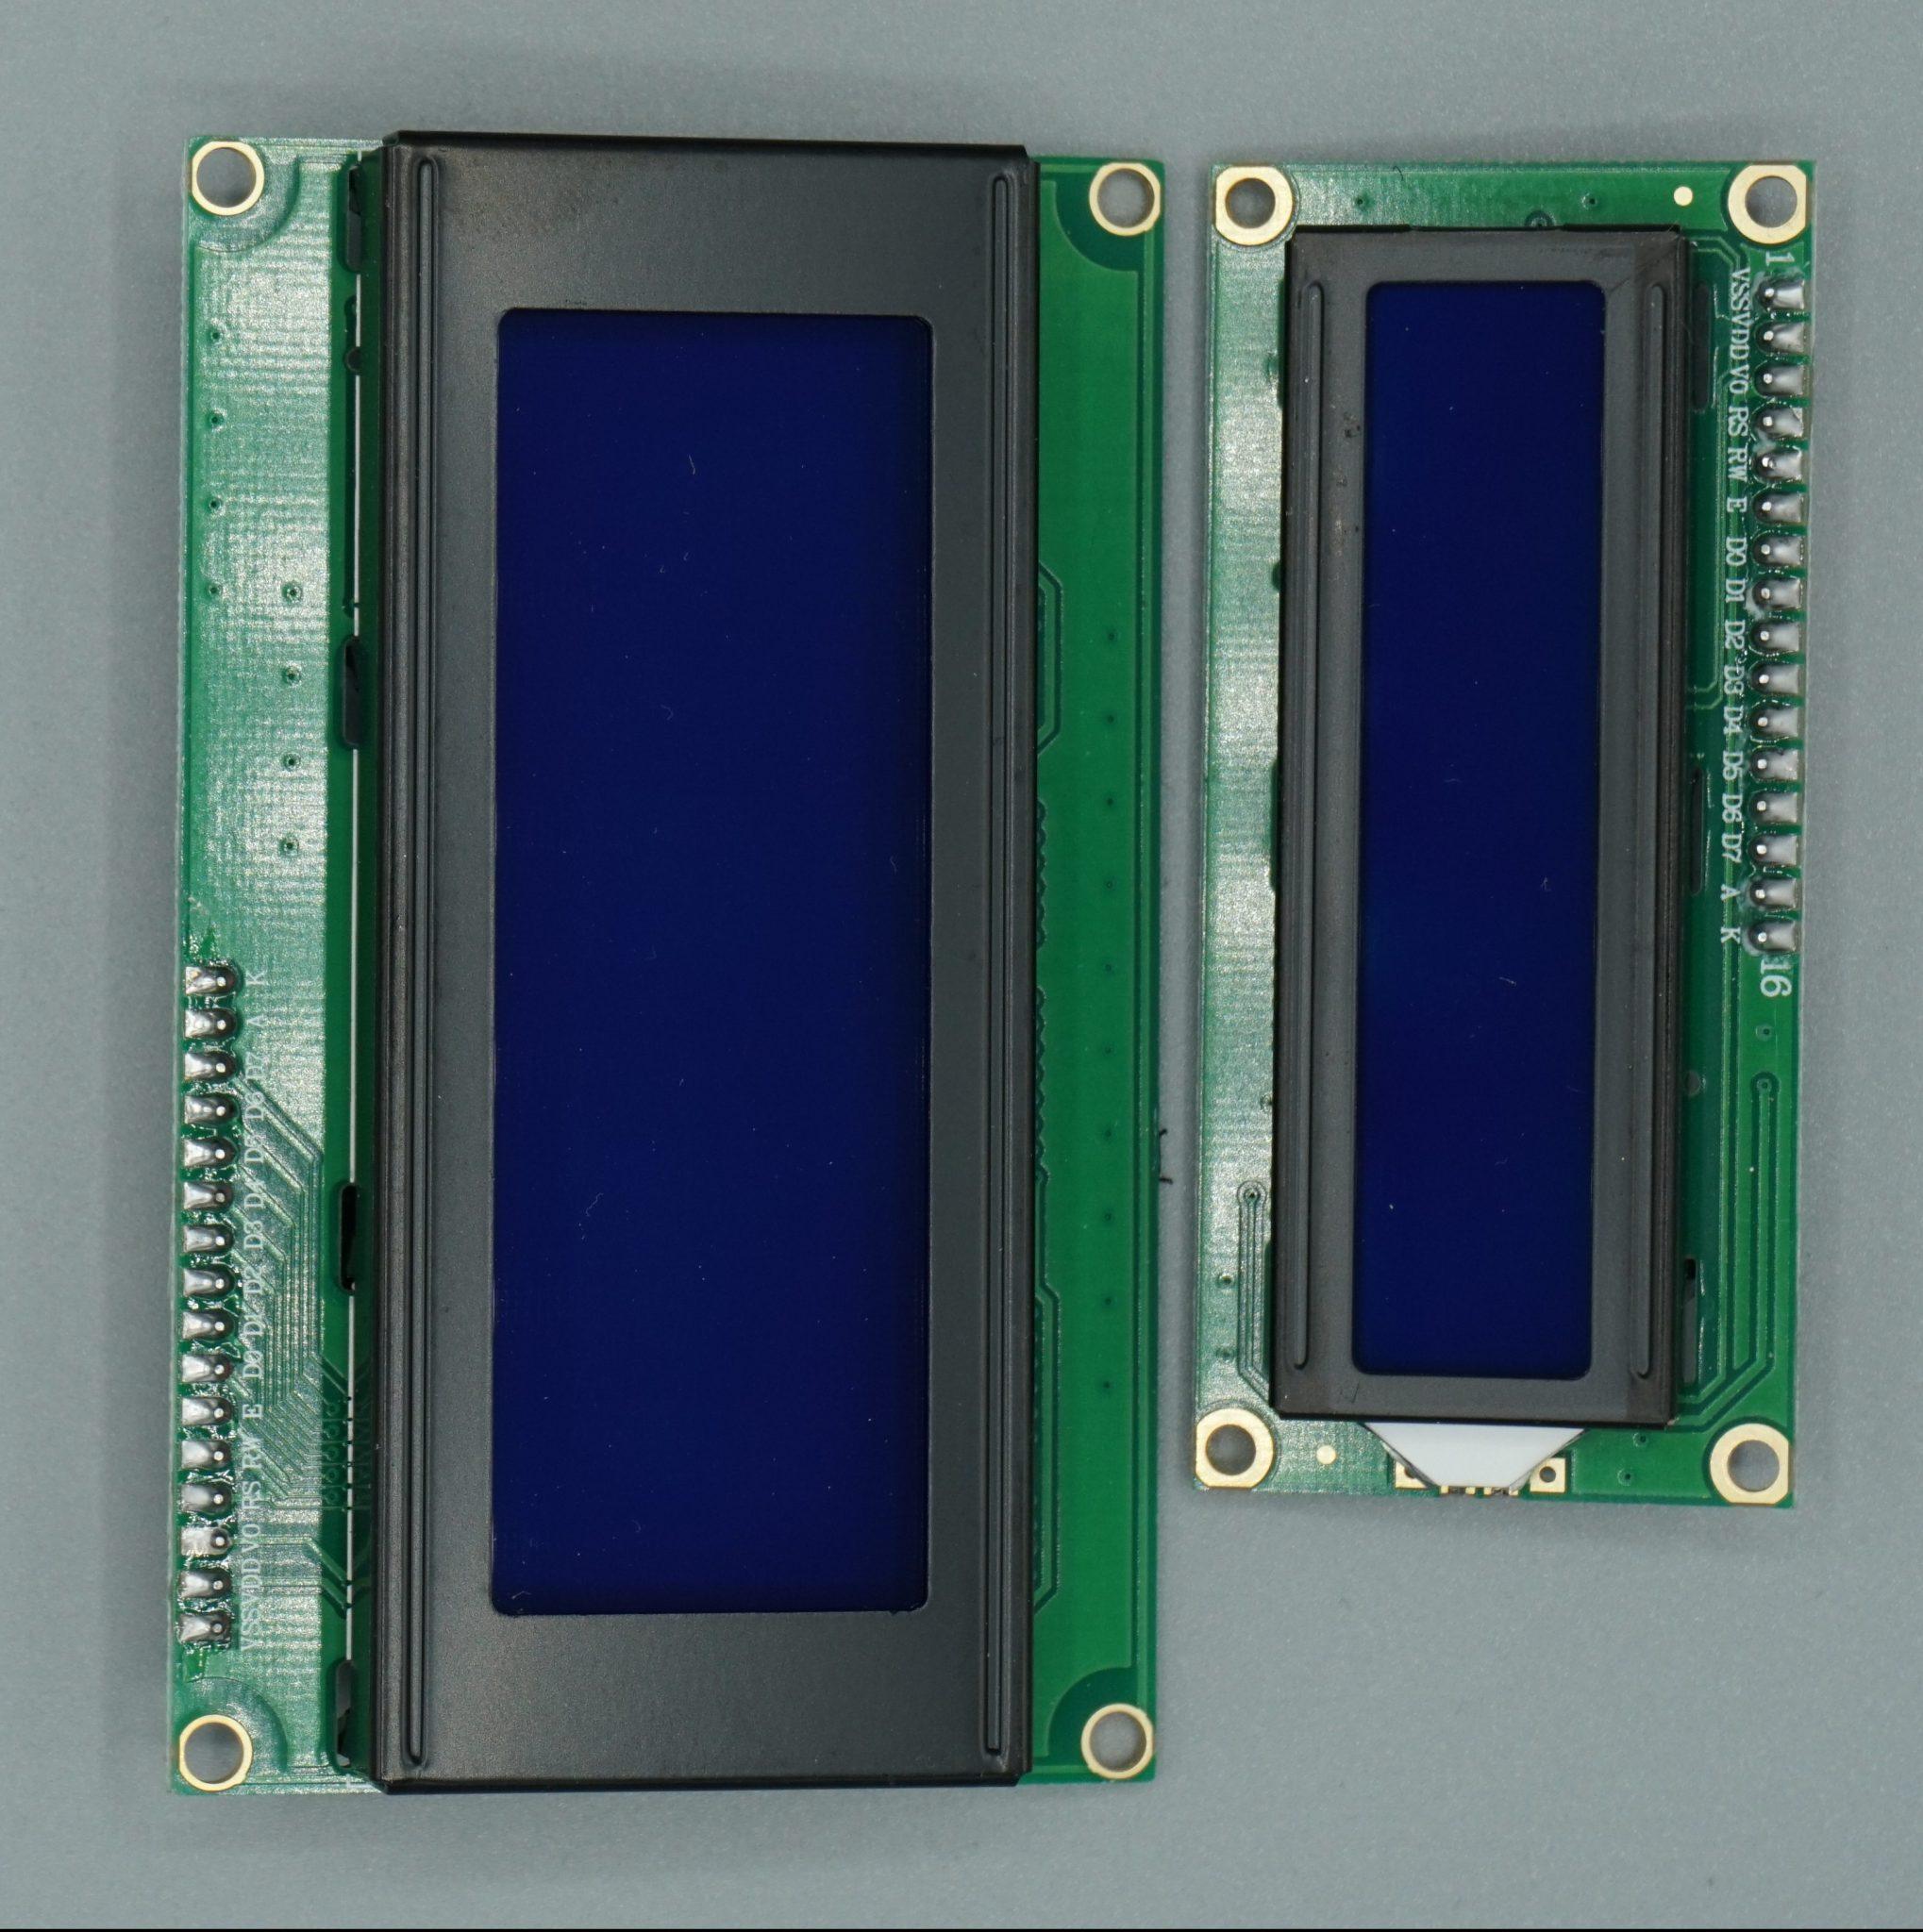 LCD display comparison